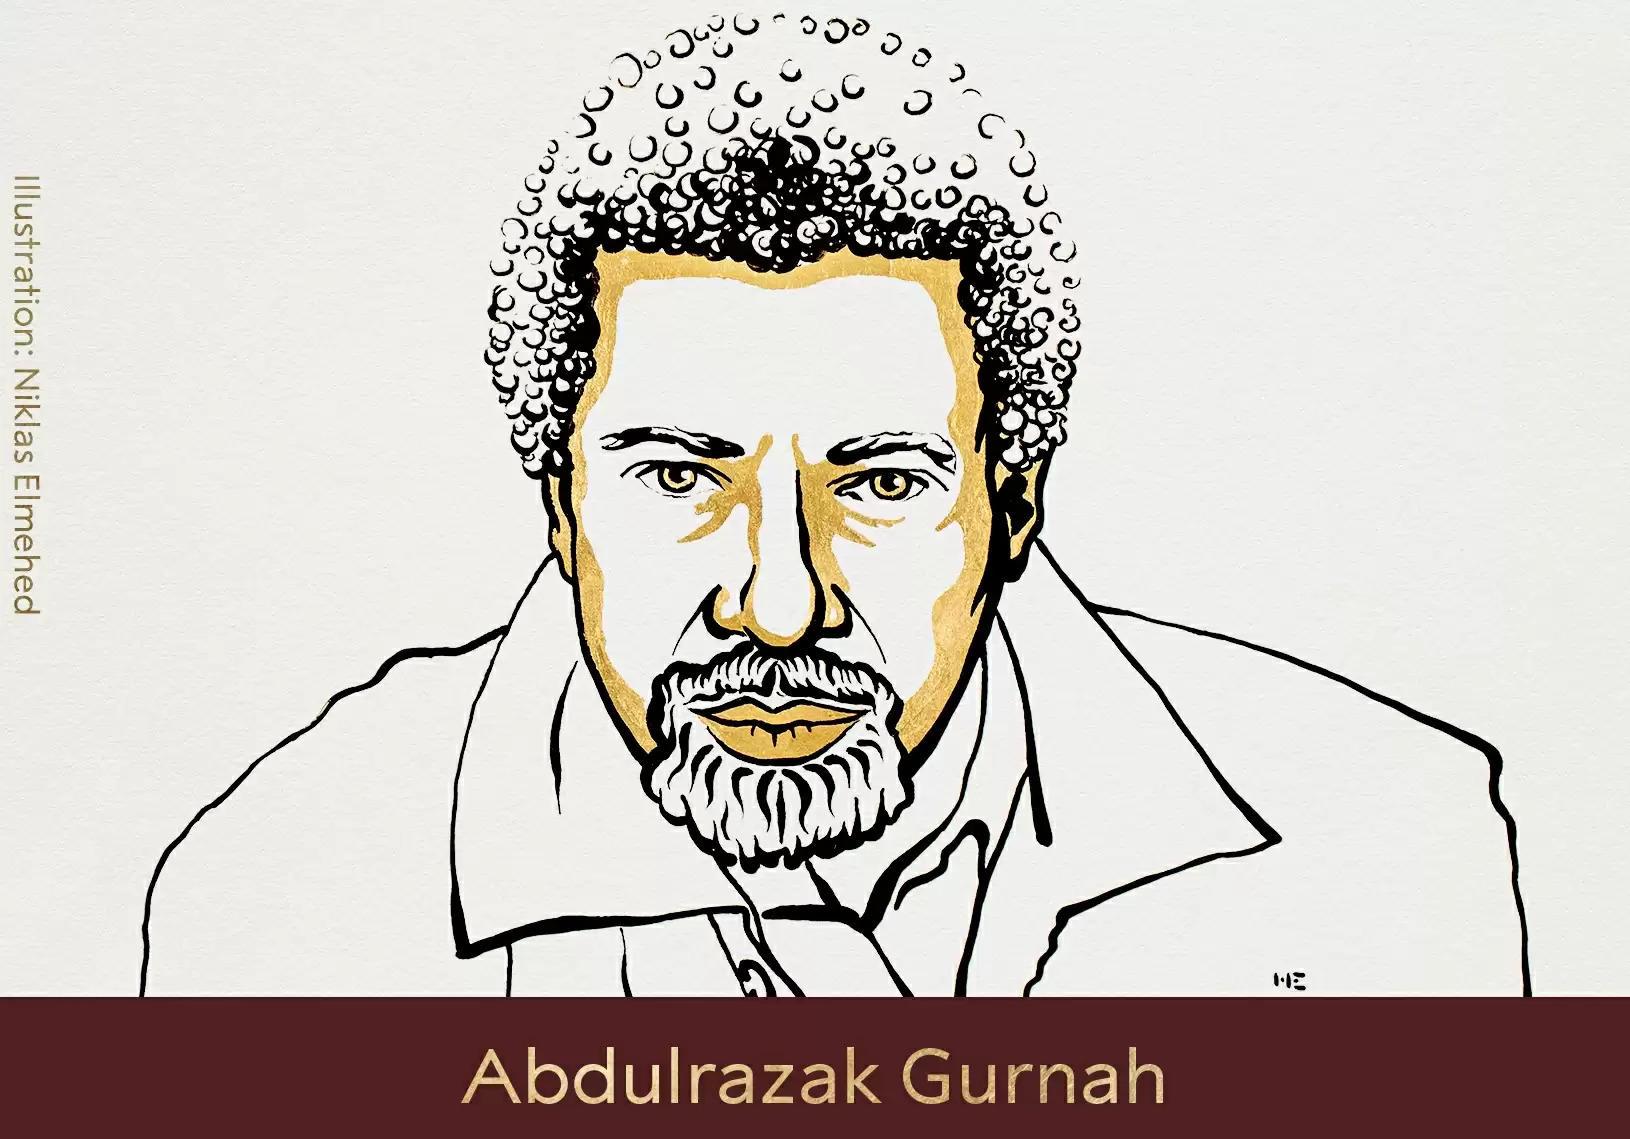 Abdulrazak-Gurnah